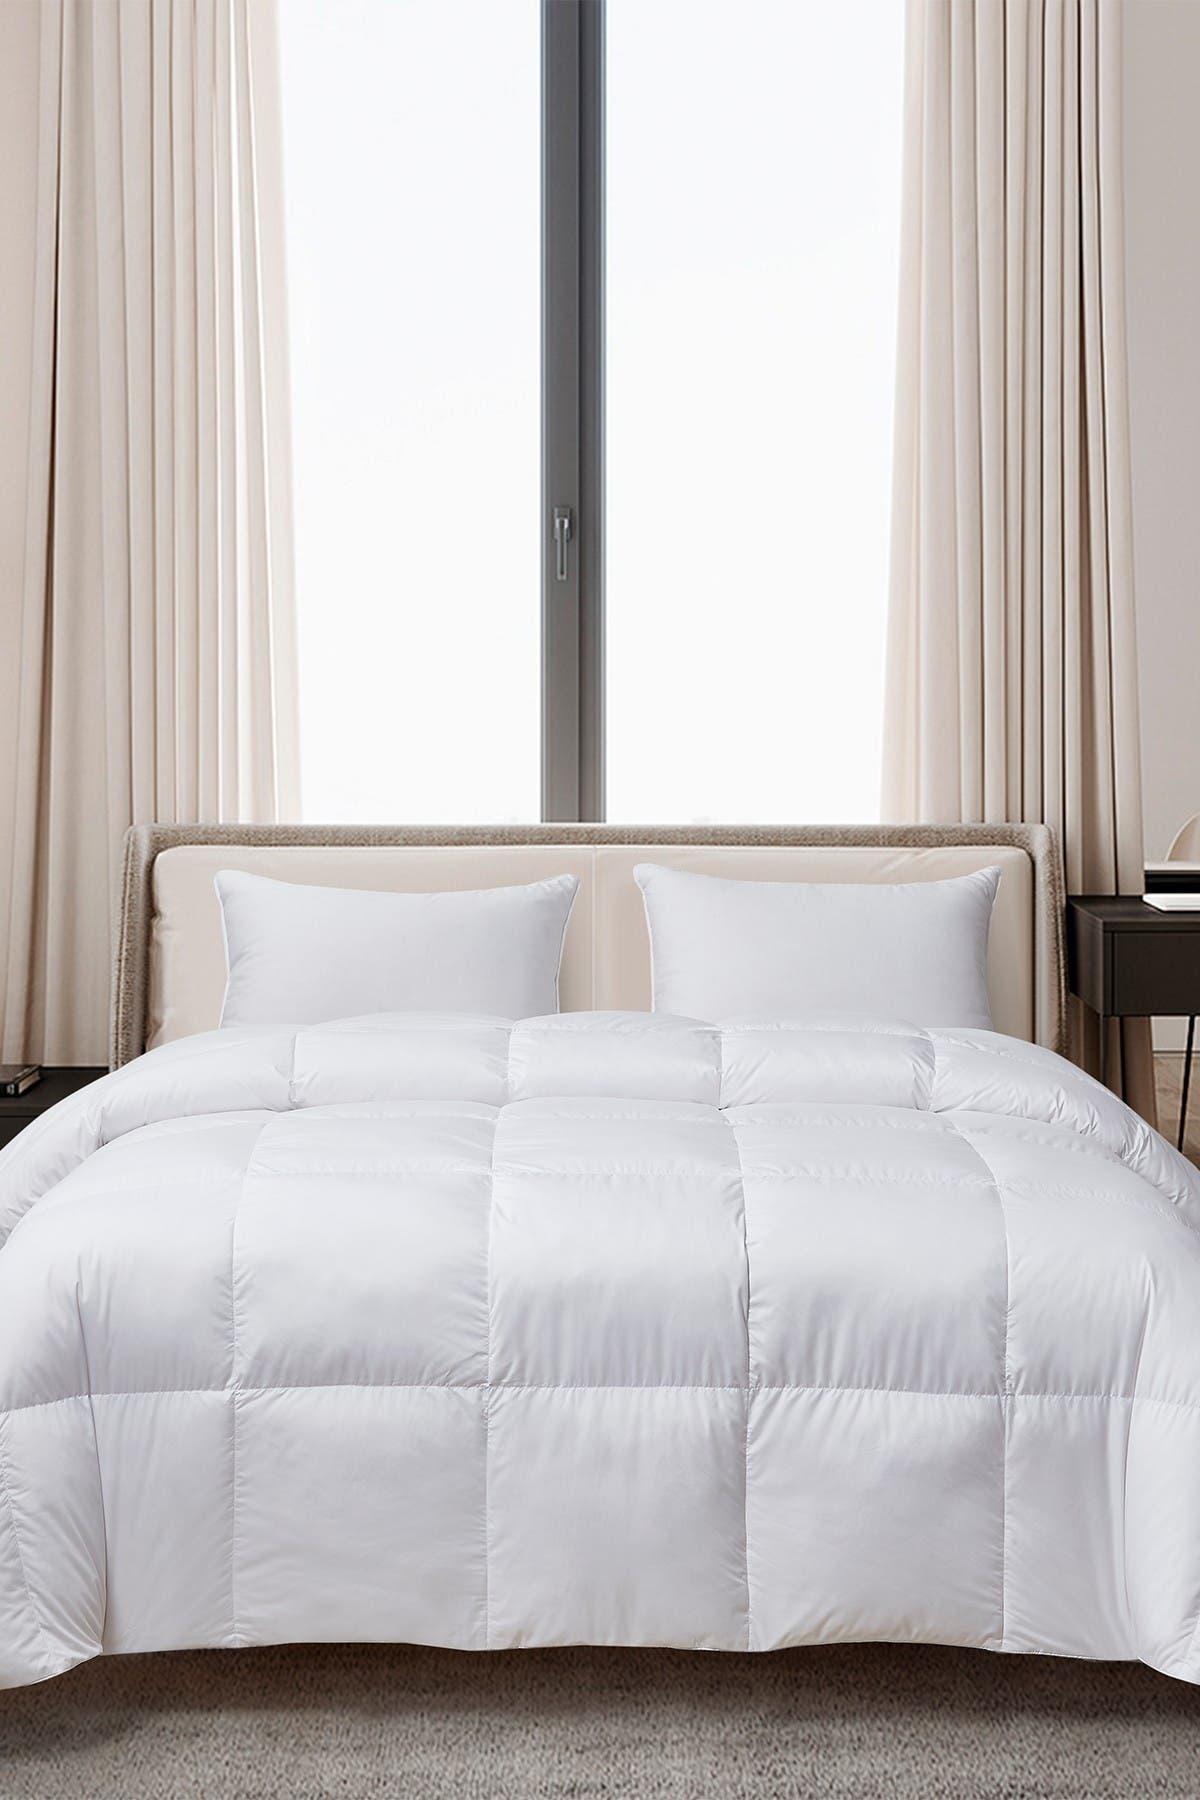 Image of Blue Ridge Home Fashions Cannon Ultra-Soft Nano-Touch All Season Down Fiber Comforter - Full/Queen - White